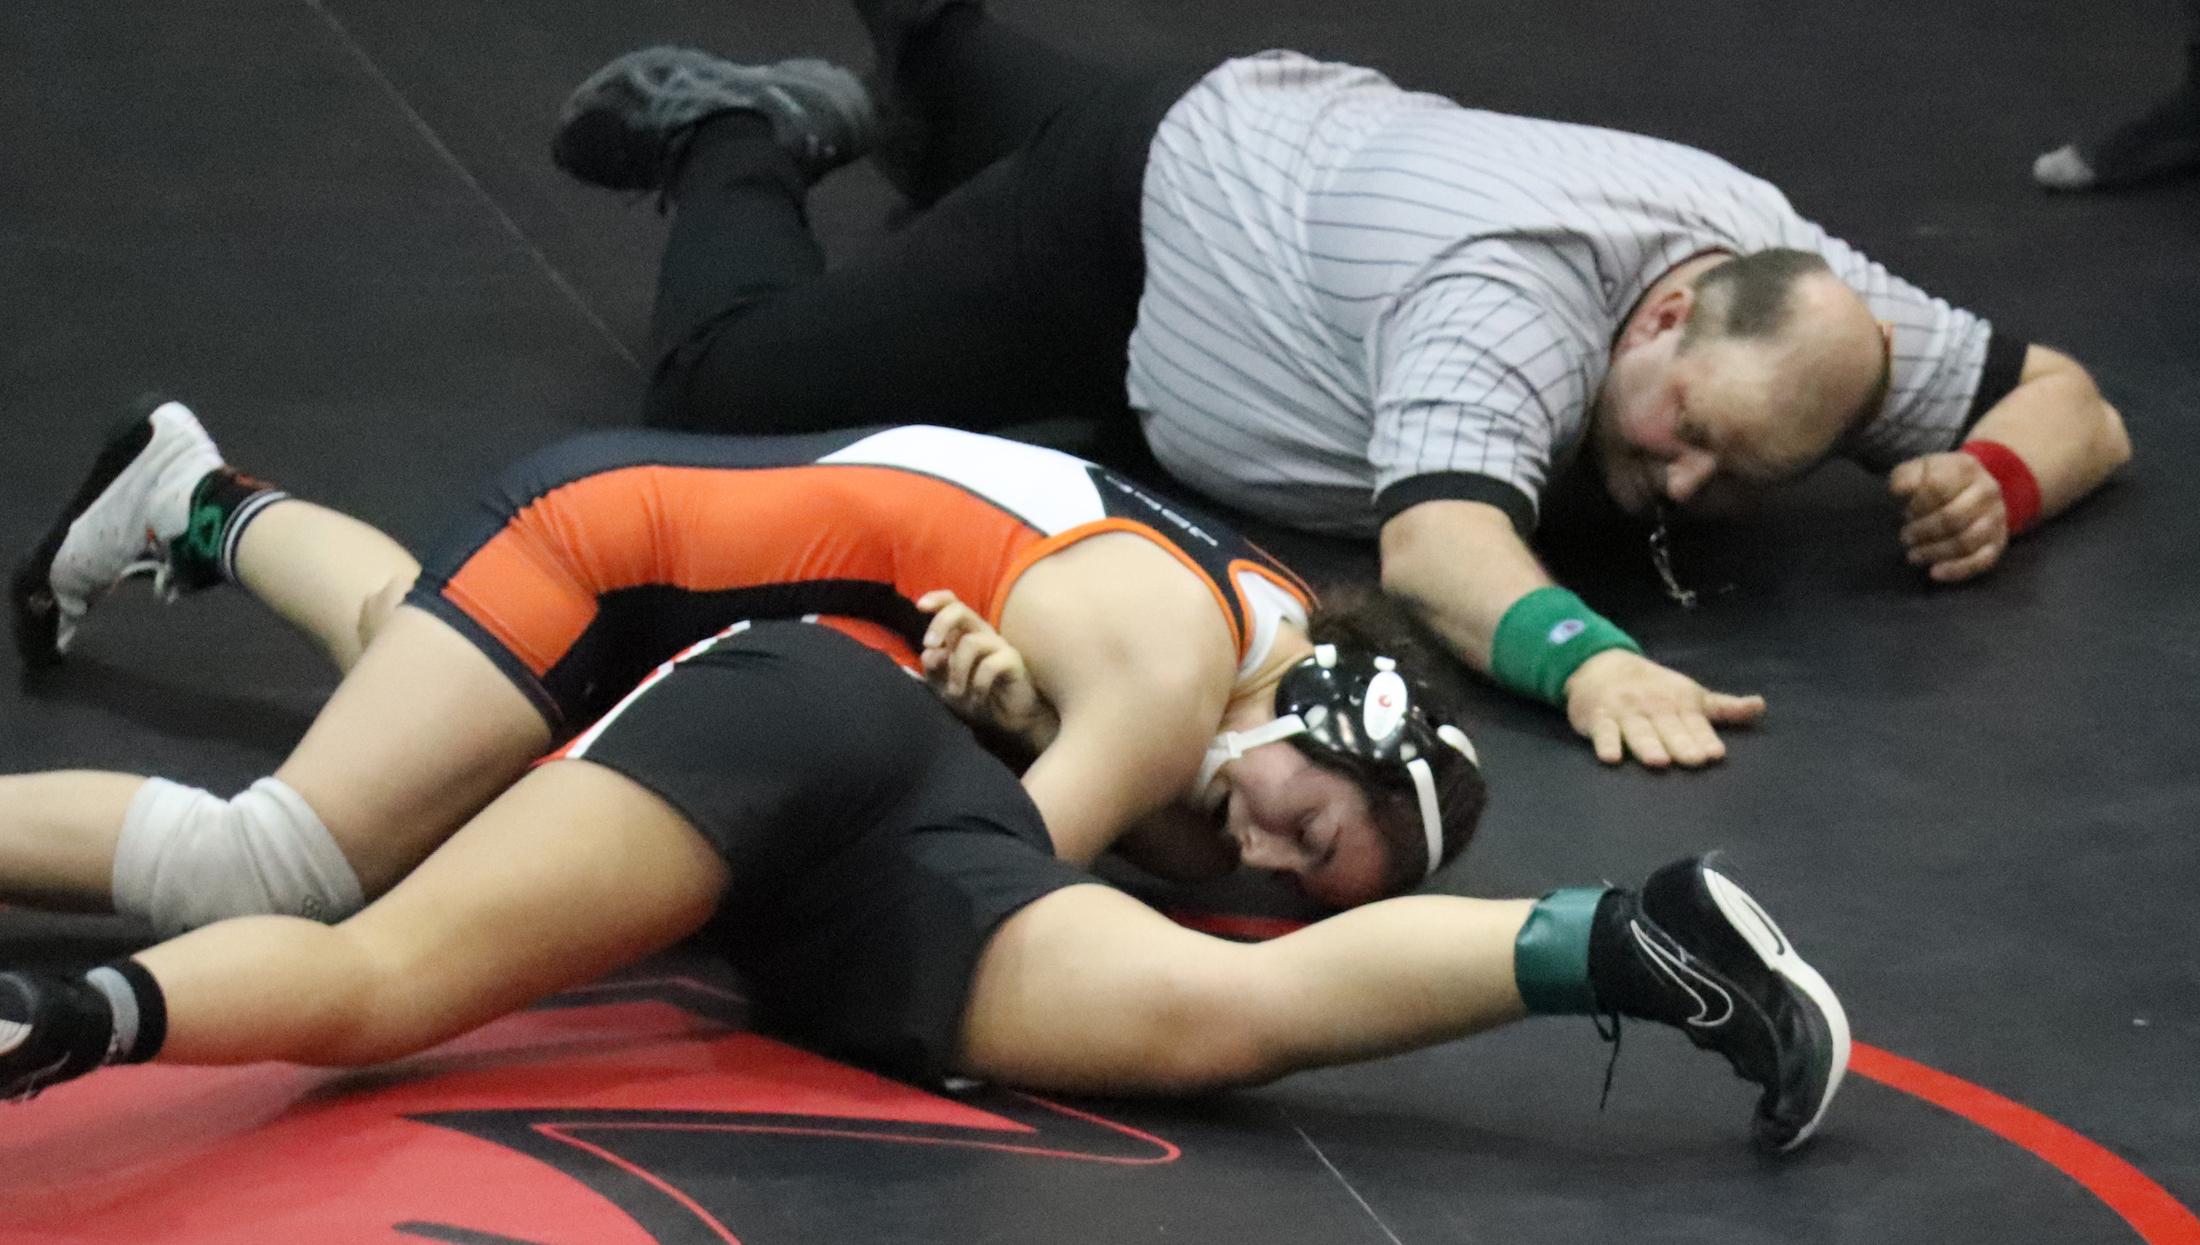 Sinnwell, Comet girls shine at Keith Vry Wrestling Invitational